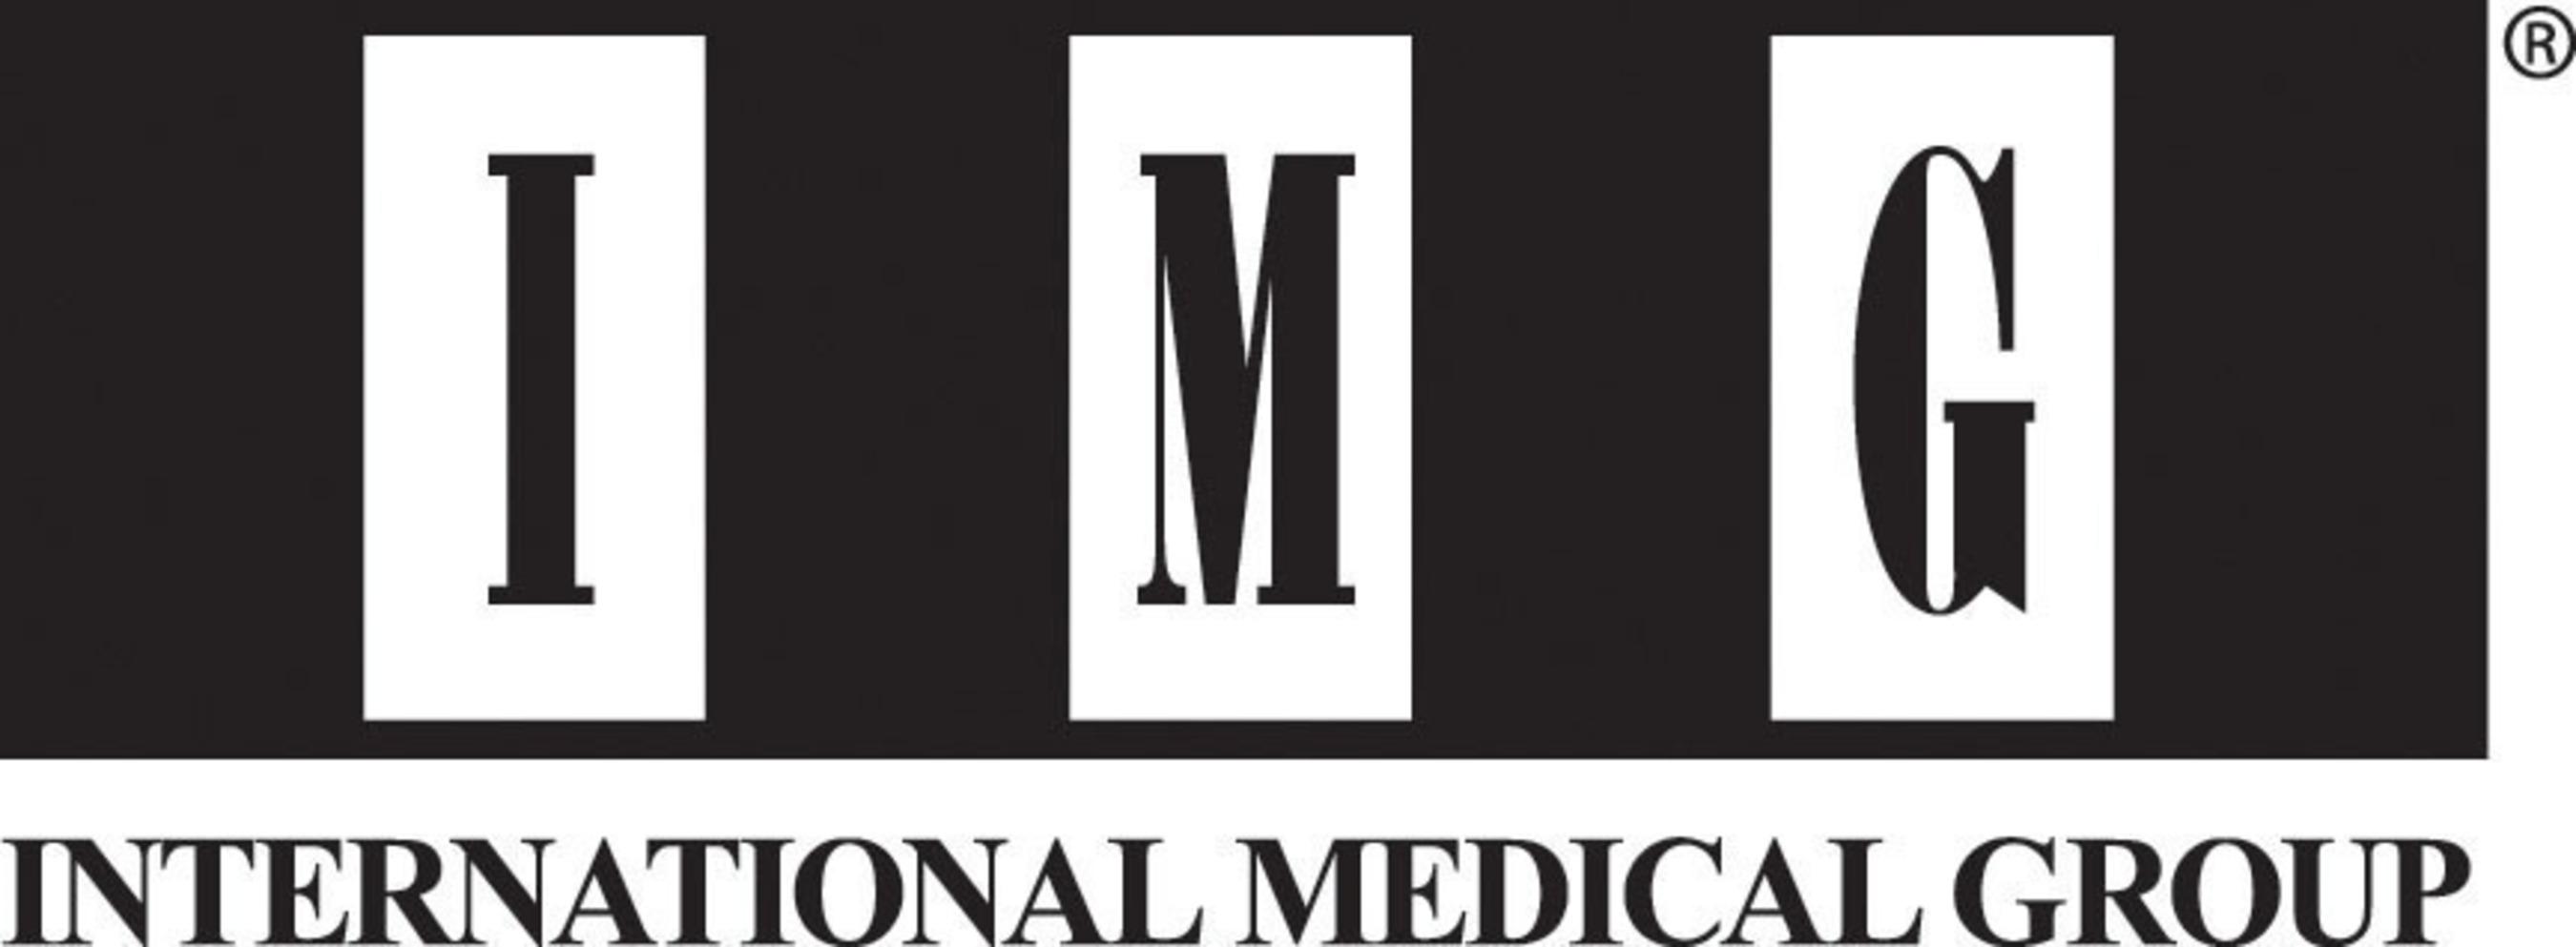 International Medical Group Announces Leadership Changes